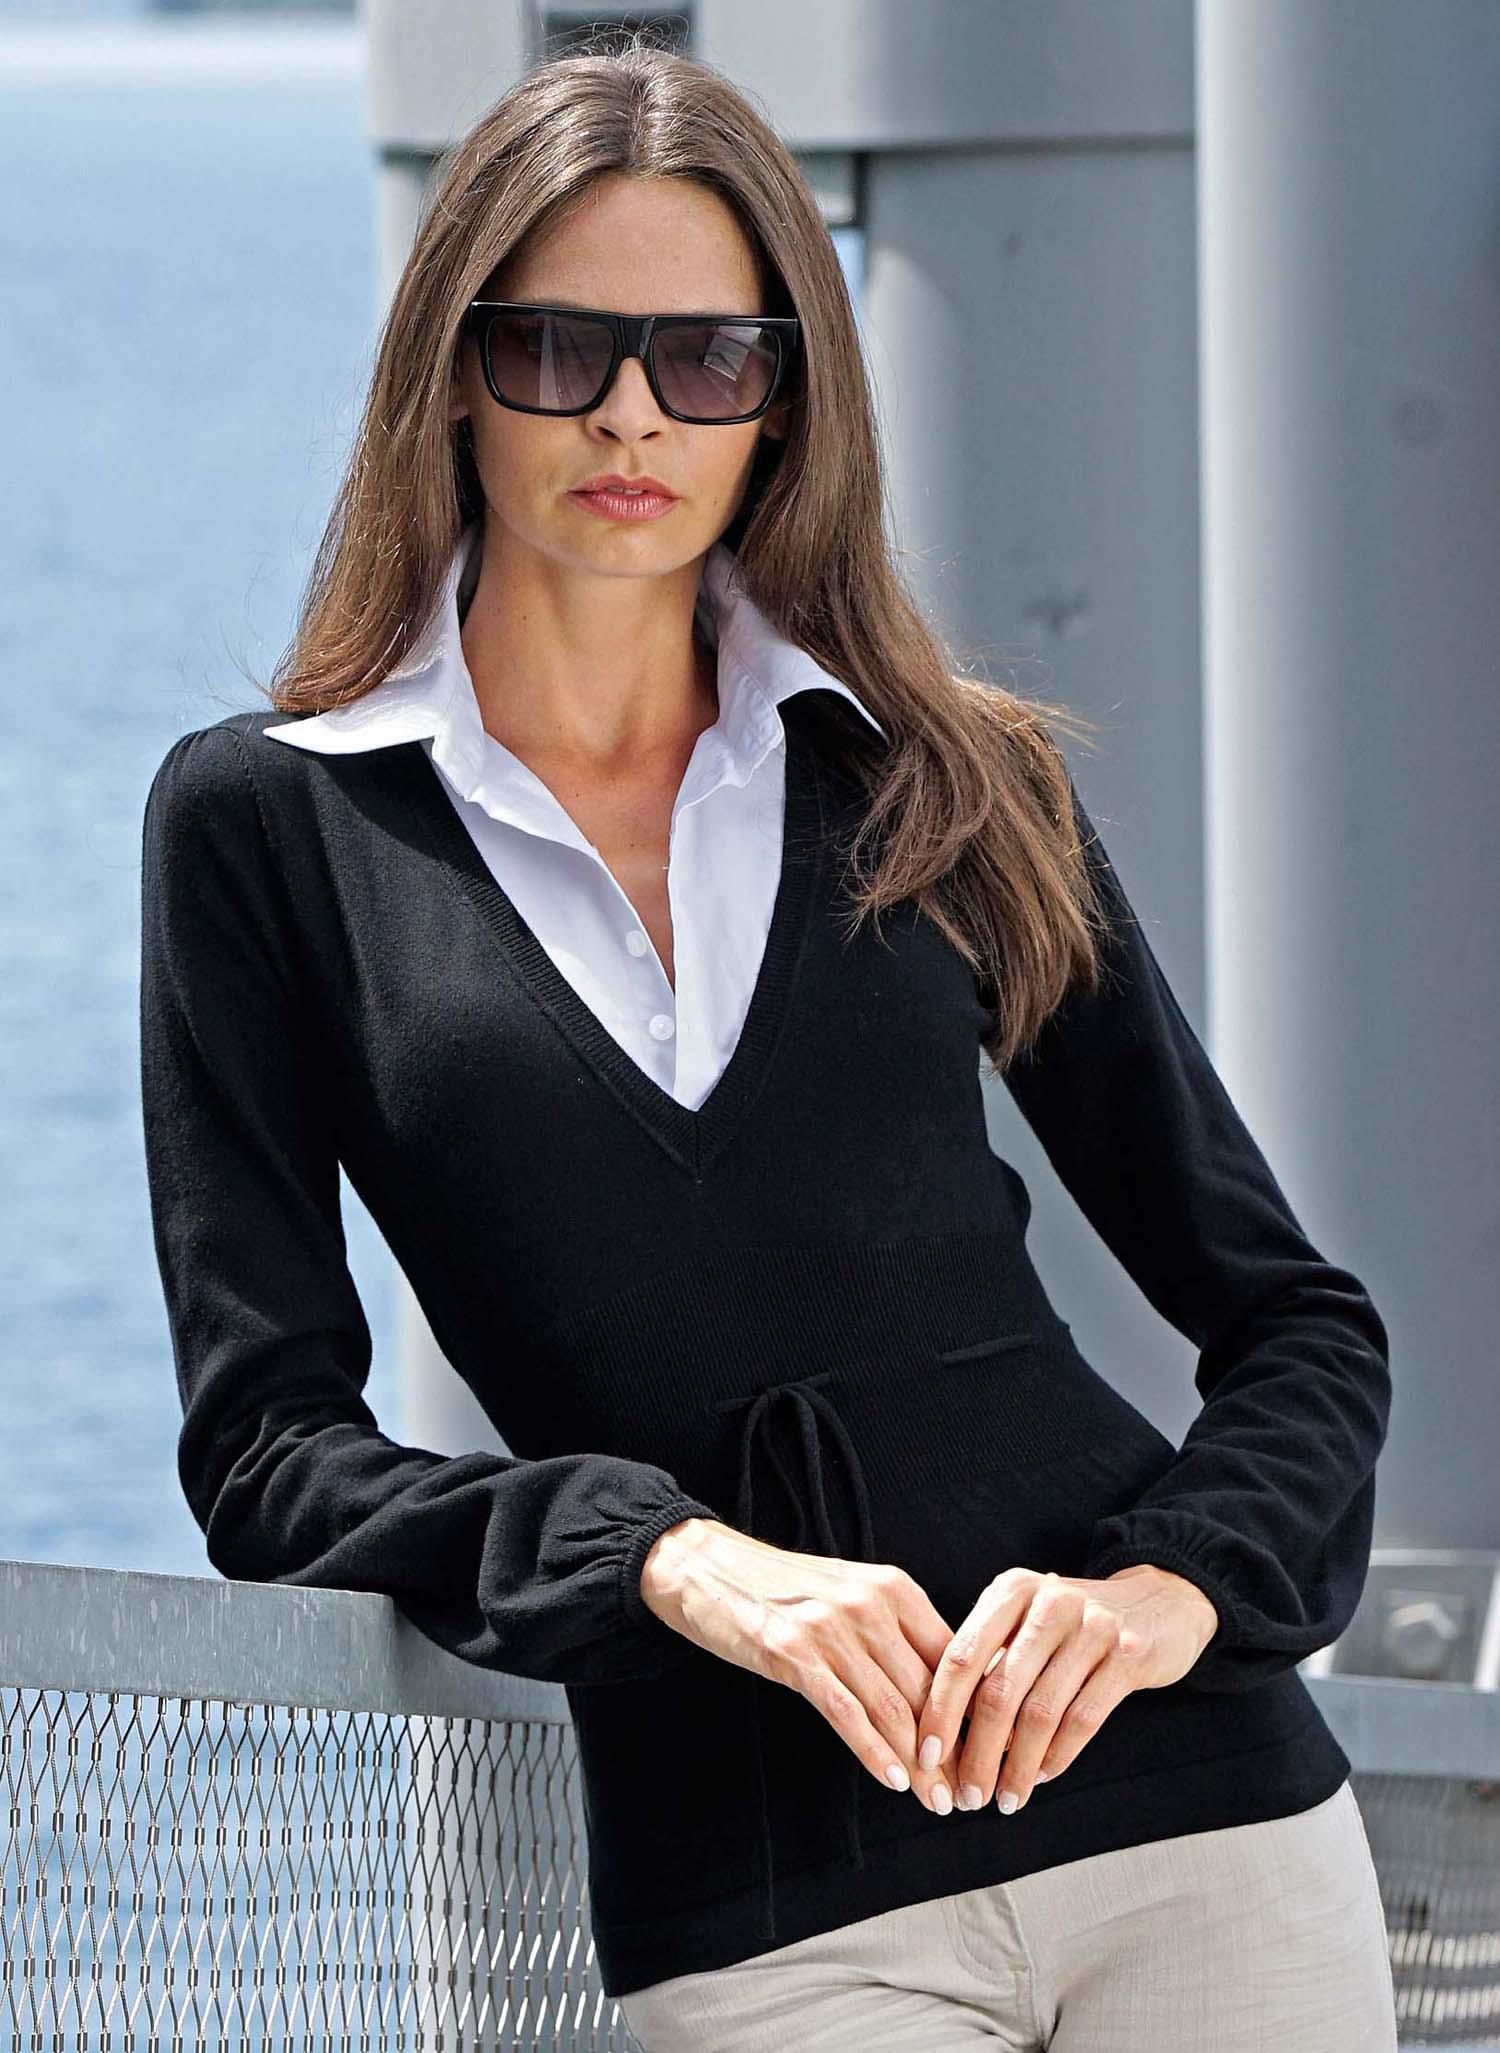 8263833c067057 D-Pullover-Bluse,schwarz L 010 - 1 - Ronja.ch